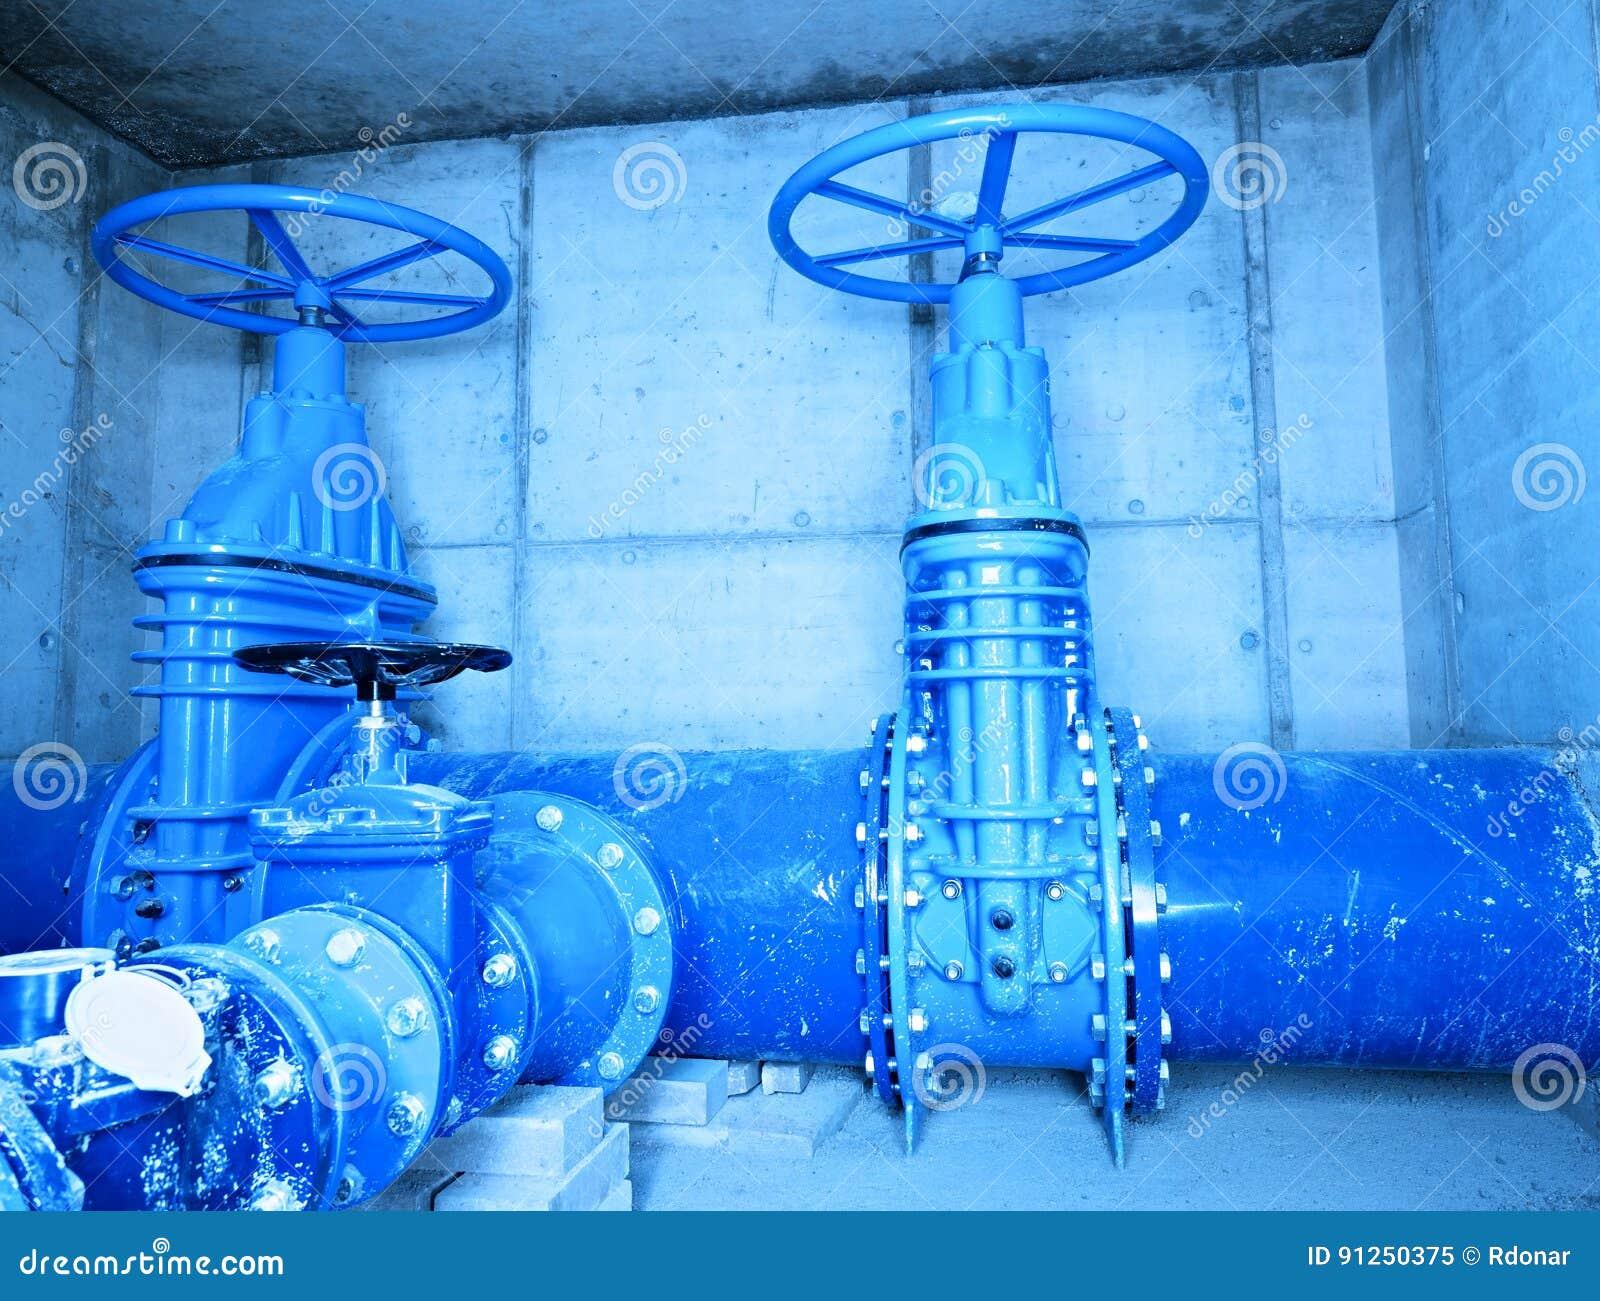 City Water Pipeline, Water Supply Company  Underground